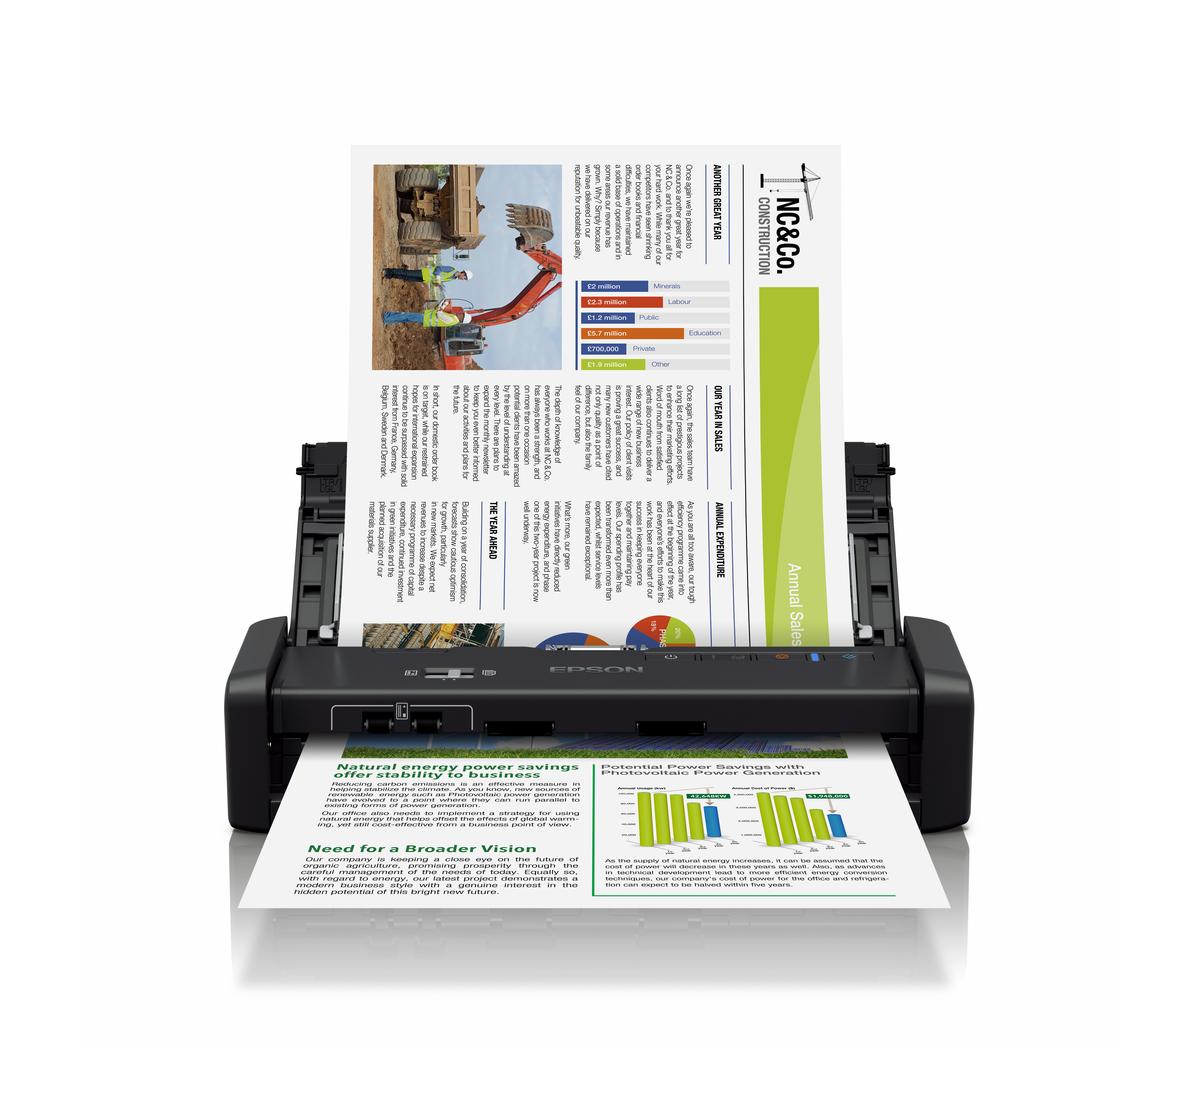 Epson workforce ds 360w wi fi portable sheet fed document scanner epson workforce ds 360w wi fi portable sheet fed document scanner reheart Image collections